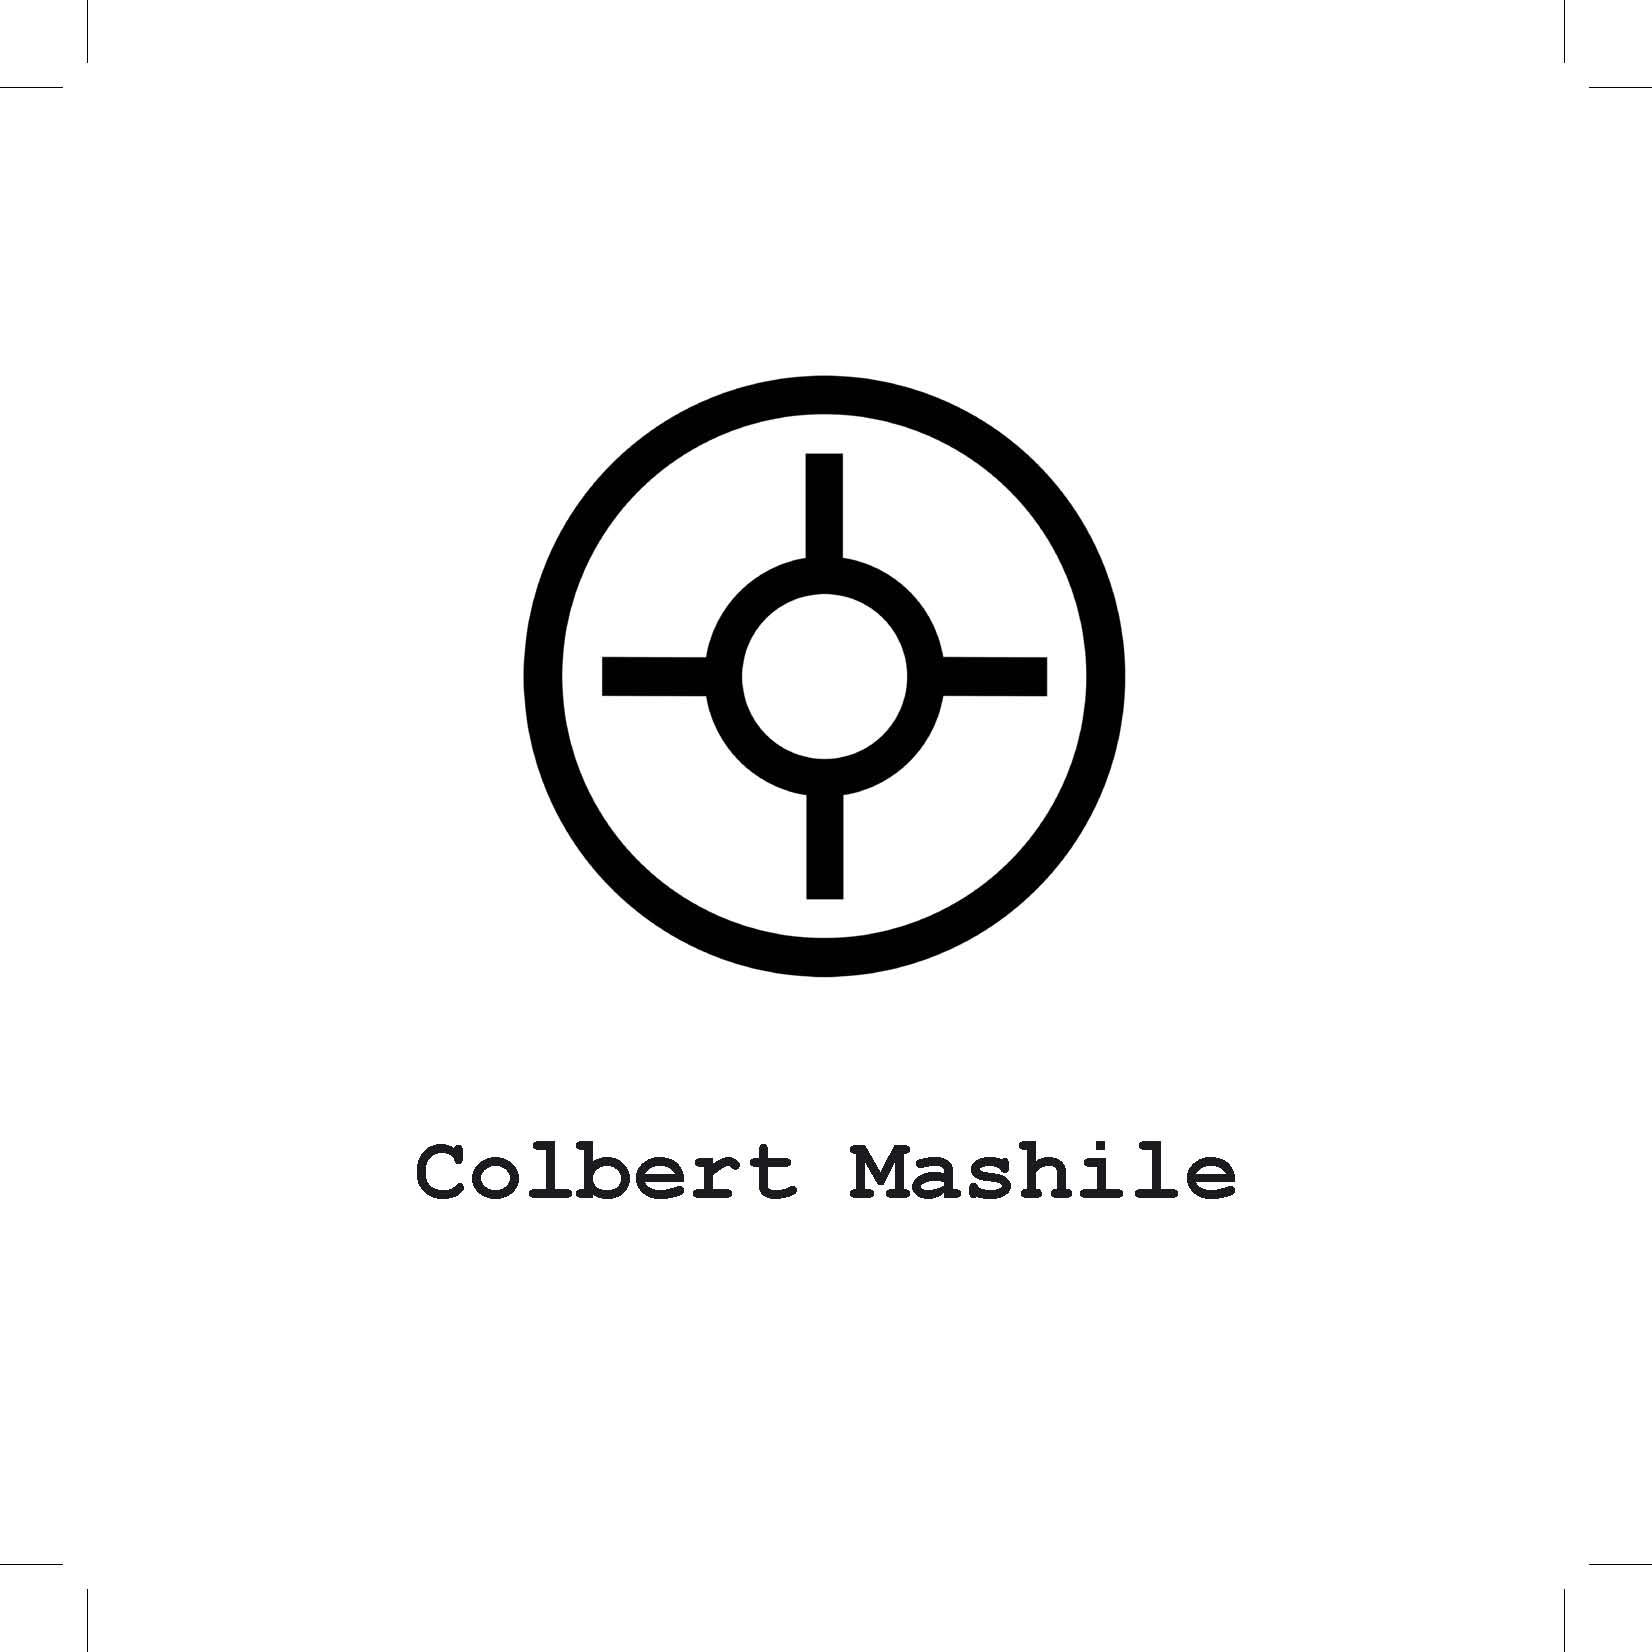 MAP Southafrica - Colbert Mashile